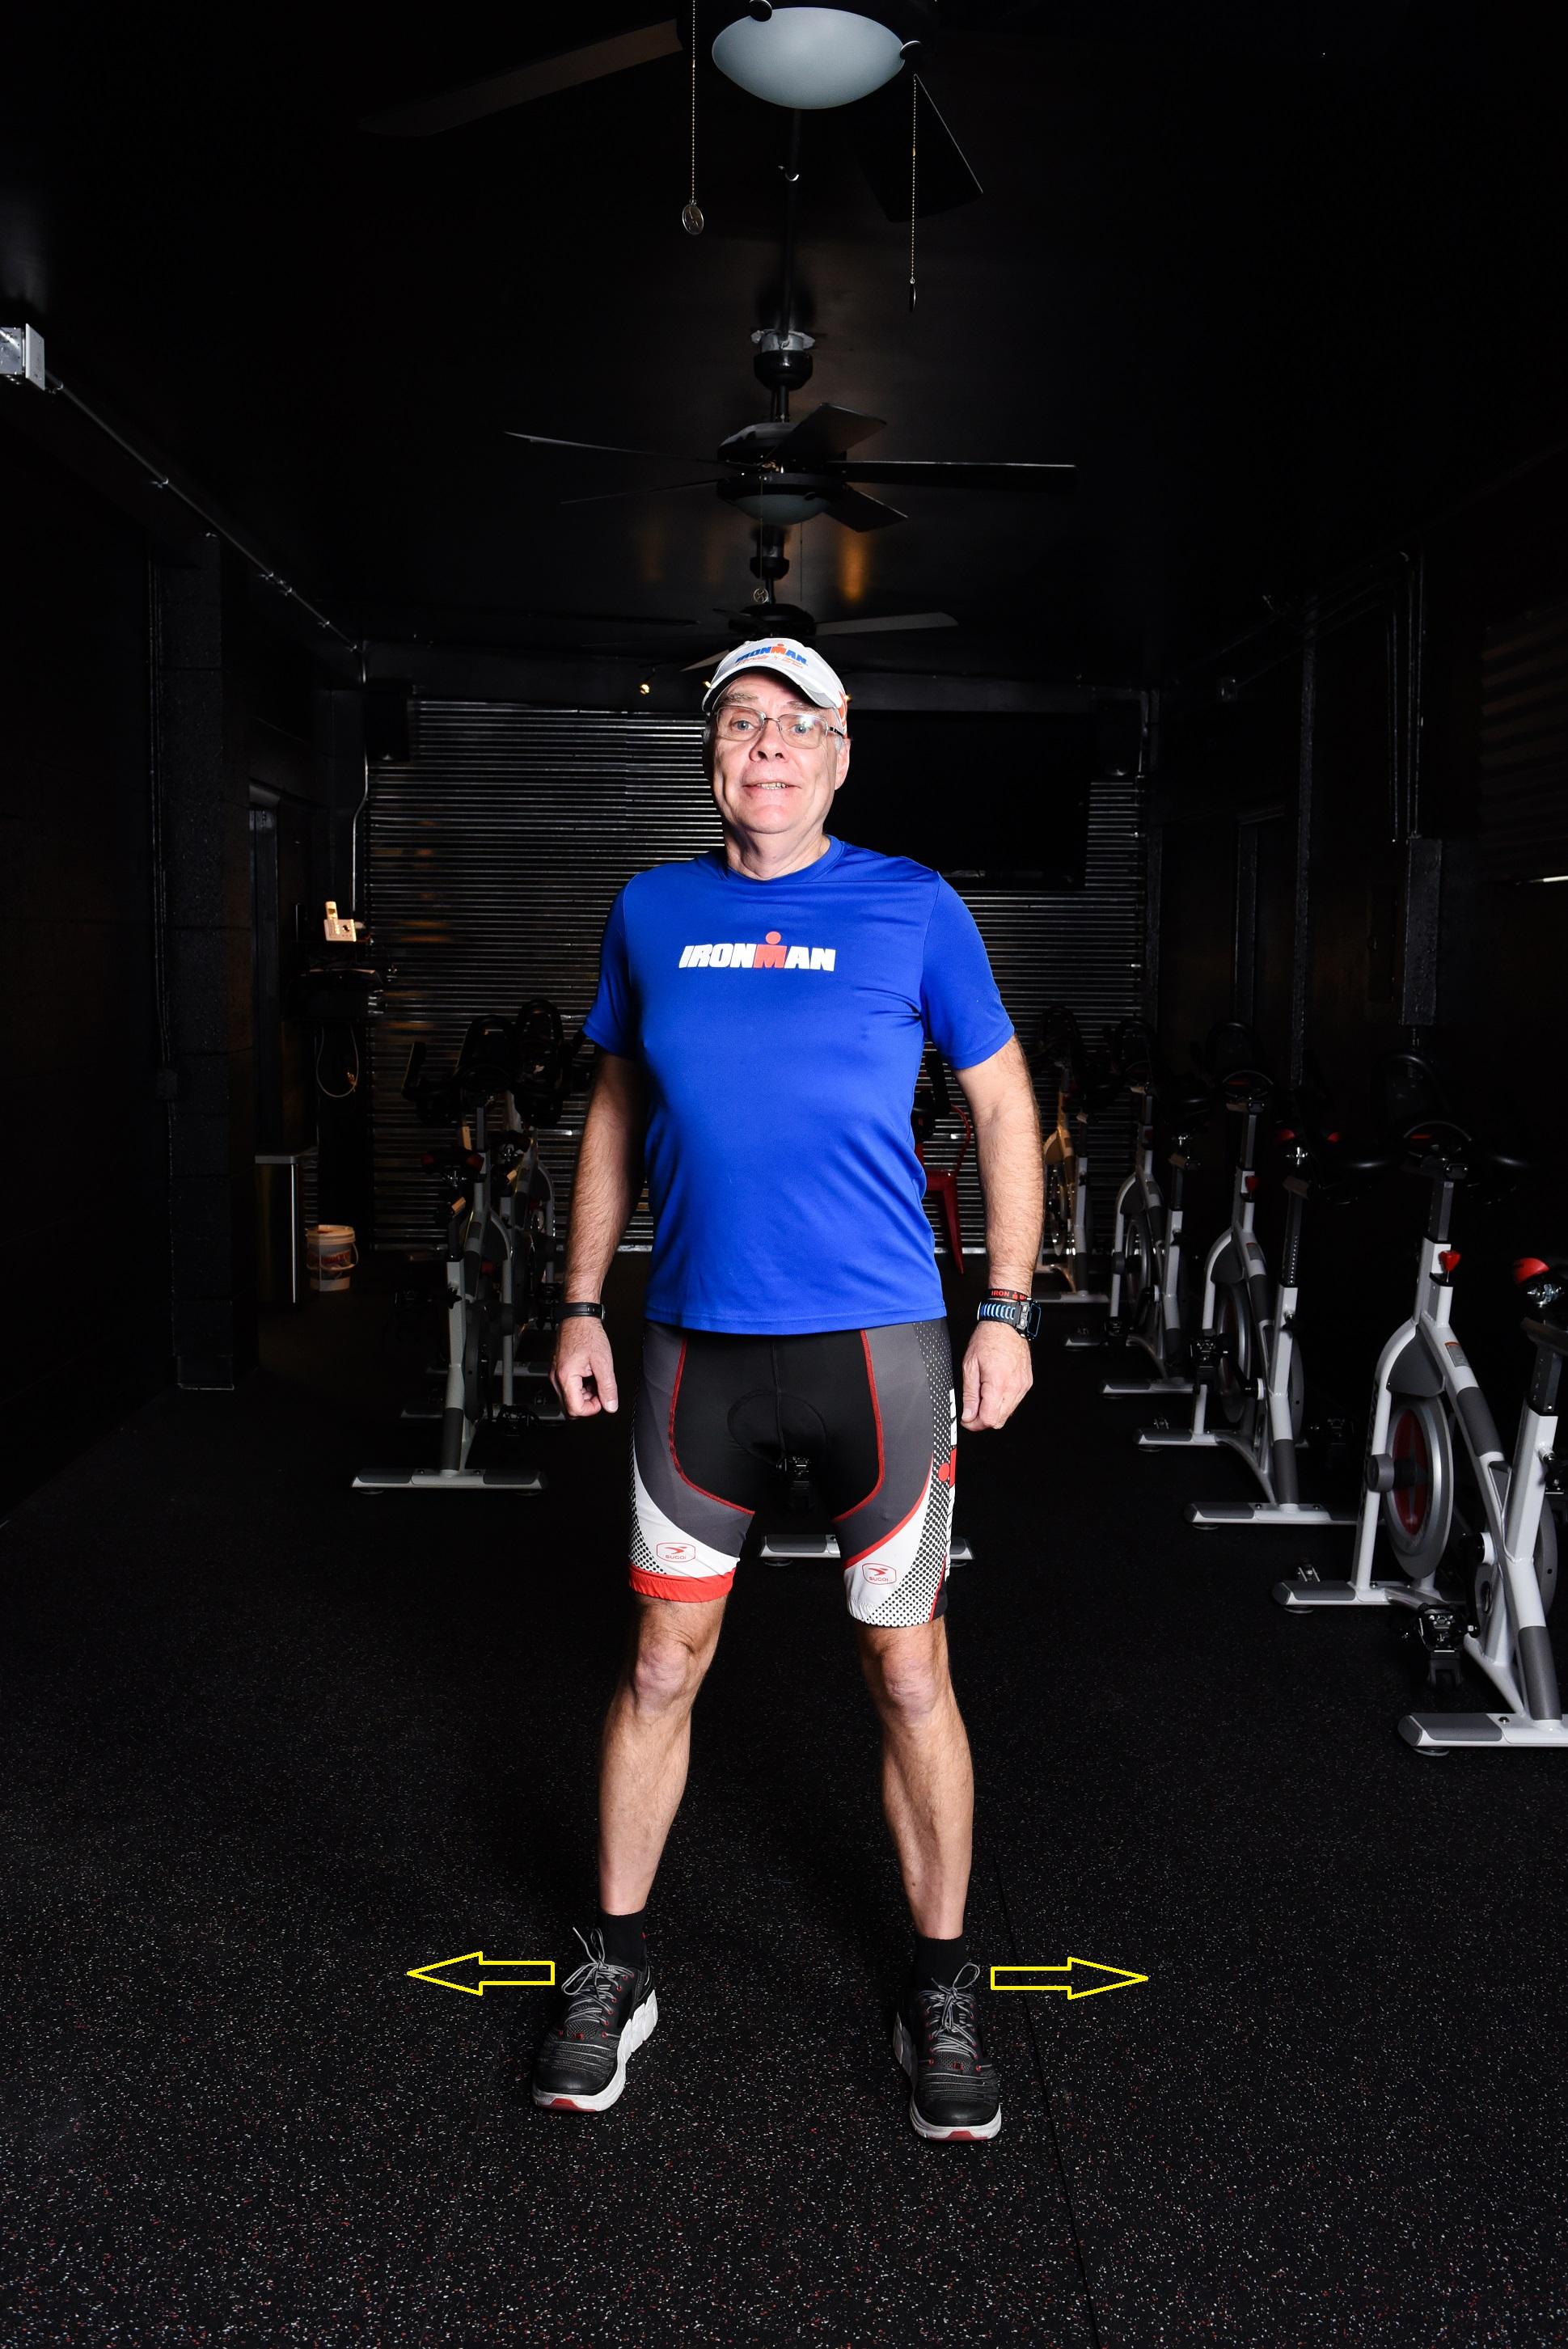 senior-fitness-exercise-isometrics